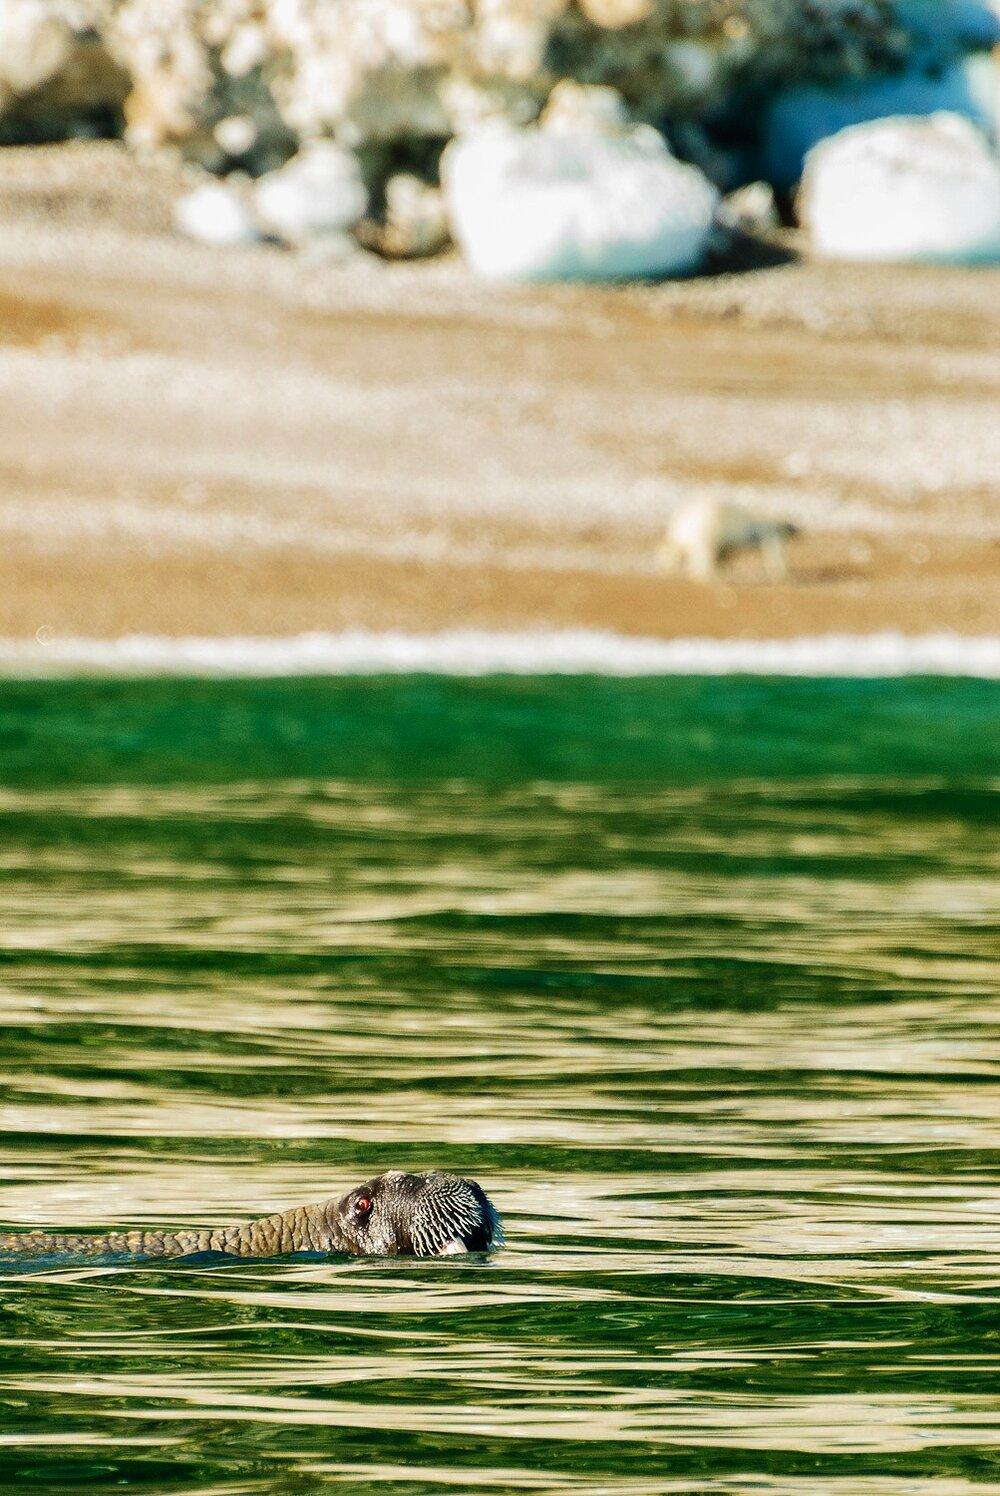 Walrus and Stranded Polar Bear - Nunavut, Canadian Arctic